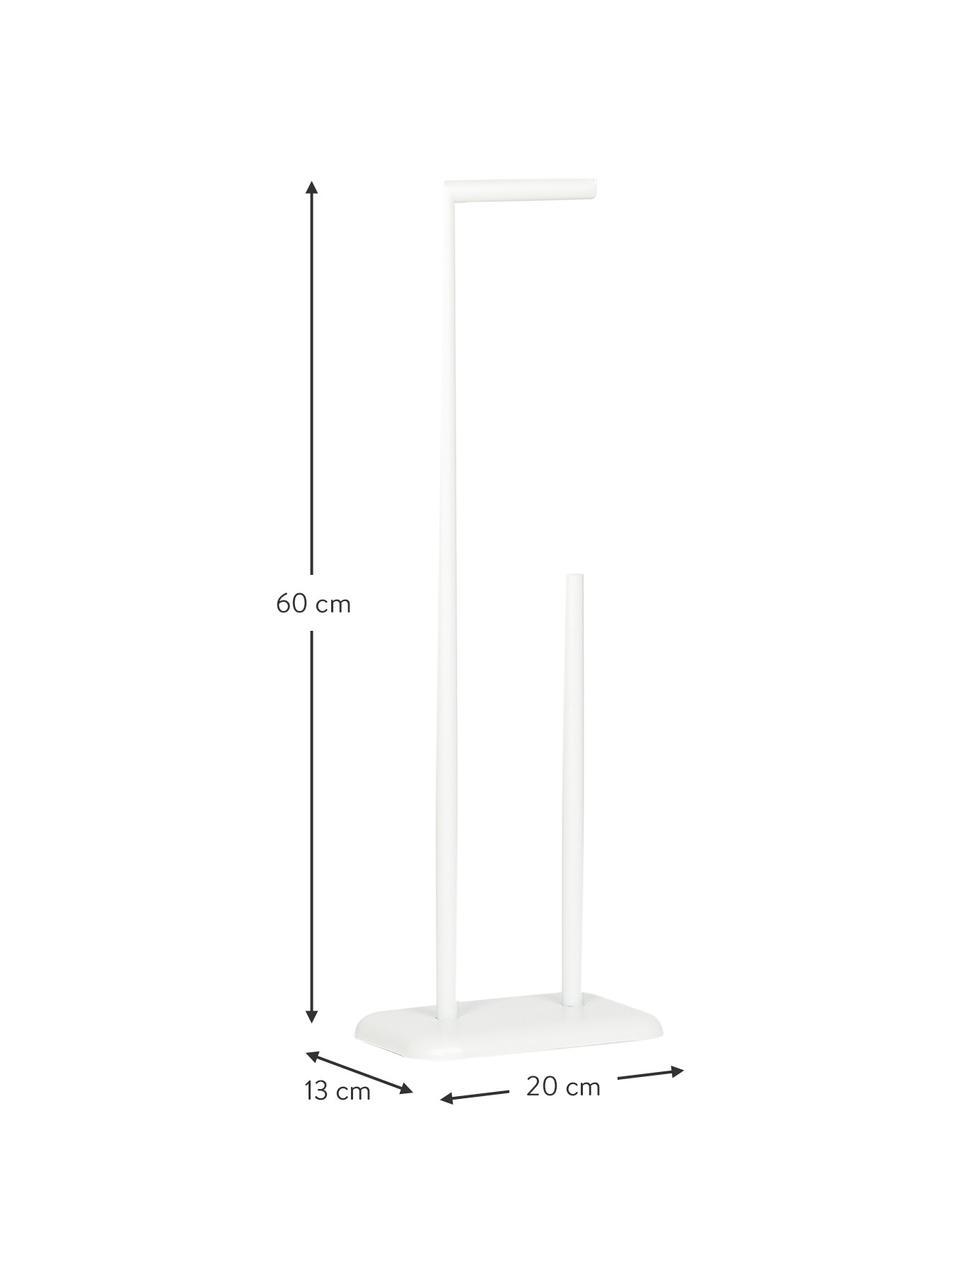 Toilettenpapierhalter Bankside, Metall, beschichtet, Weiß, 20 x 60 cm